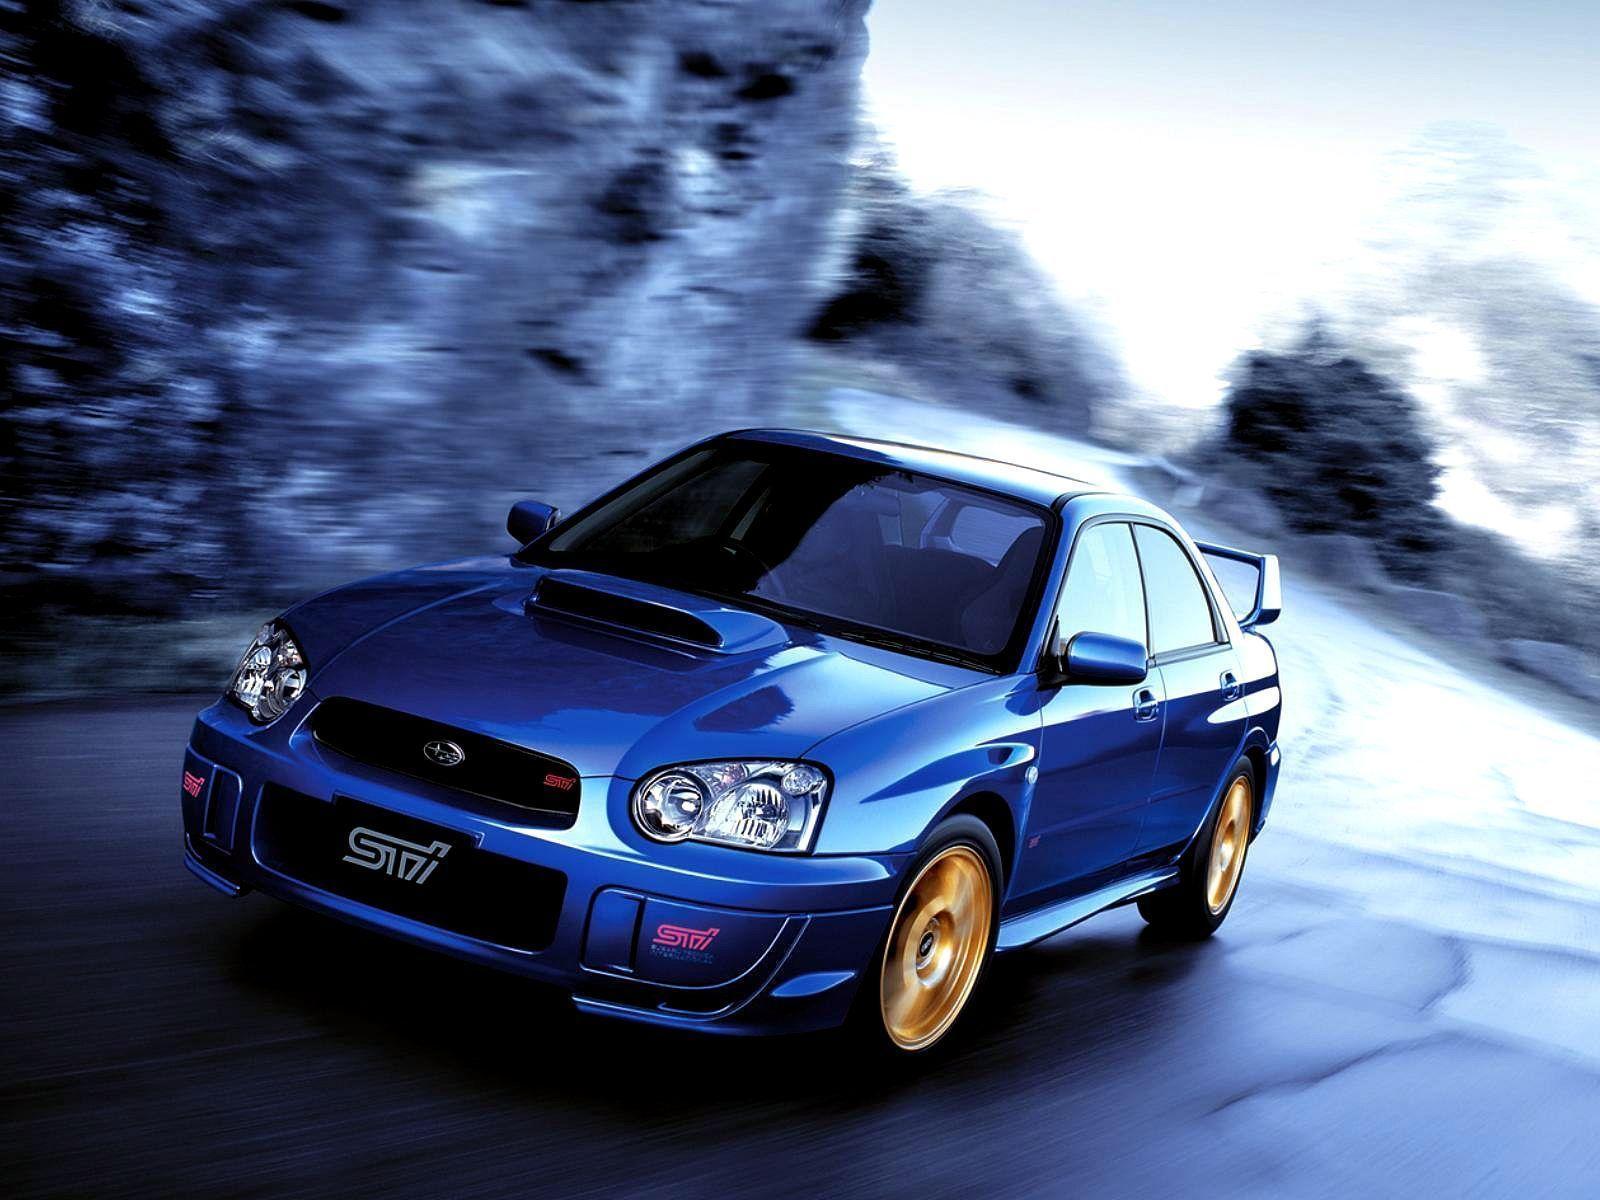 Modp Subaru Impreza Sti Chevrolet El Camino Hd Wallpaper